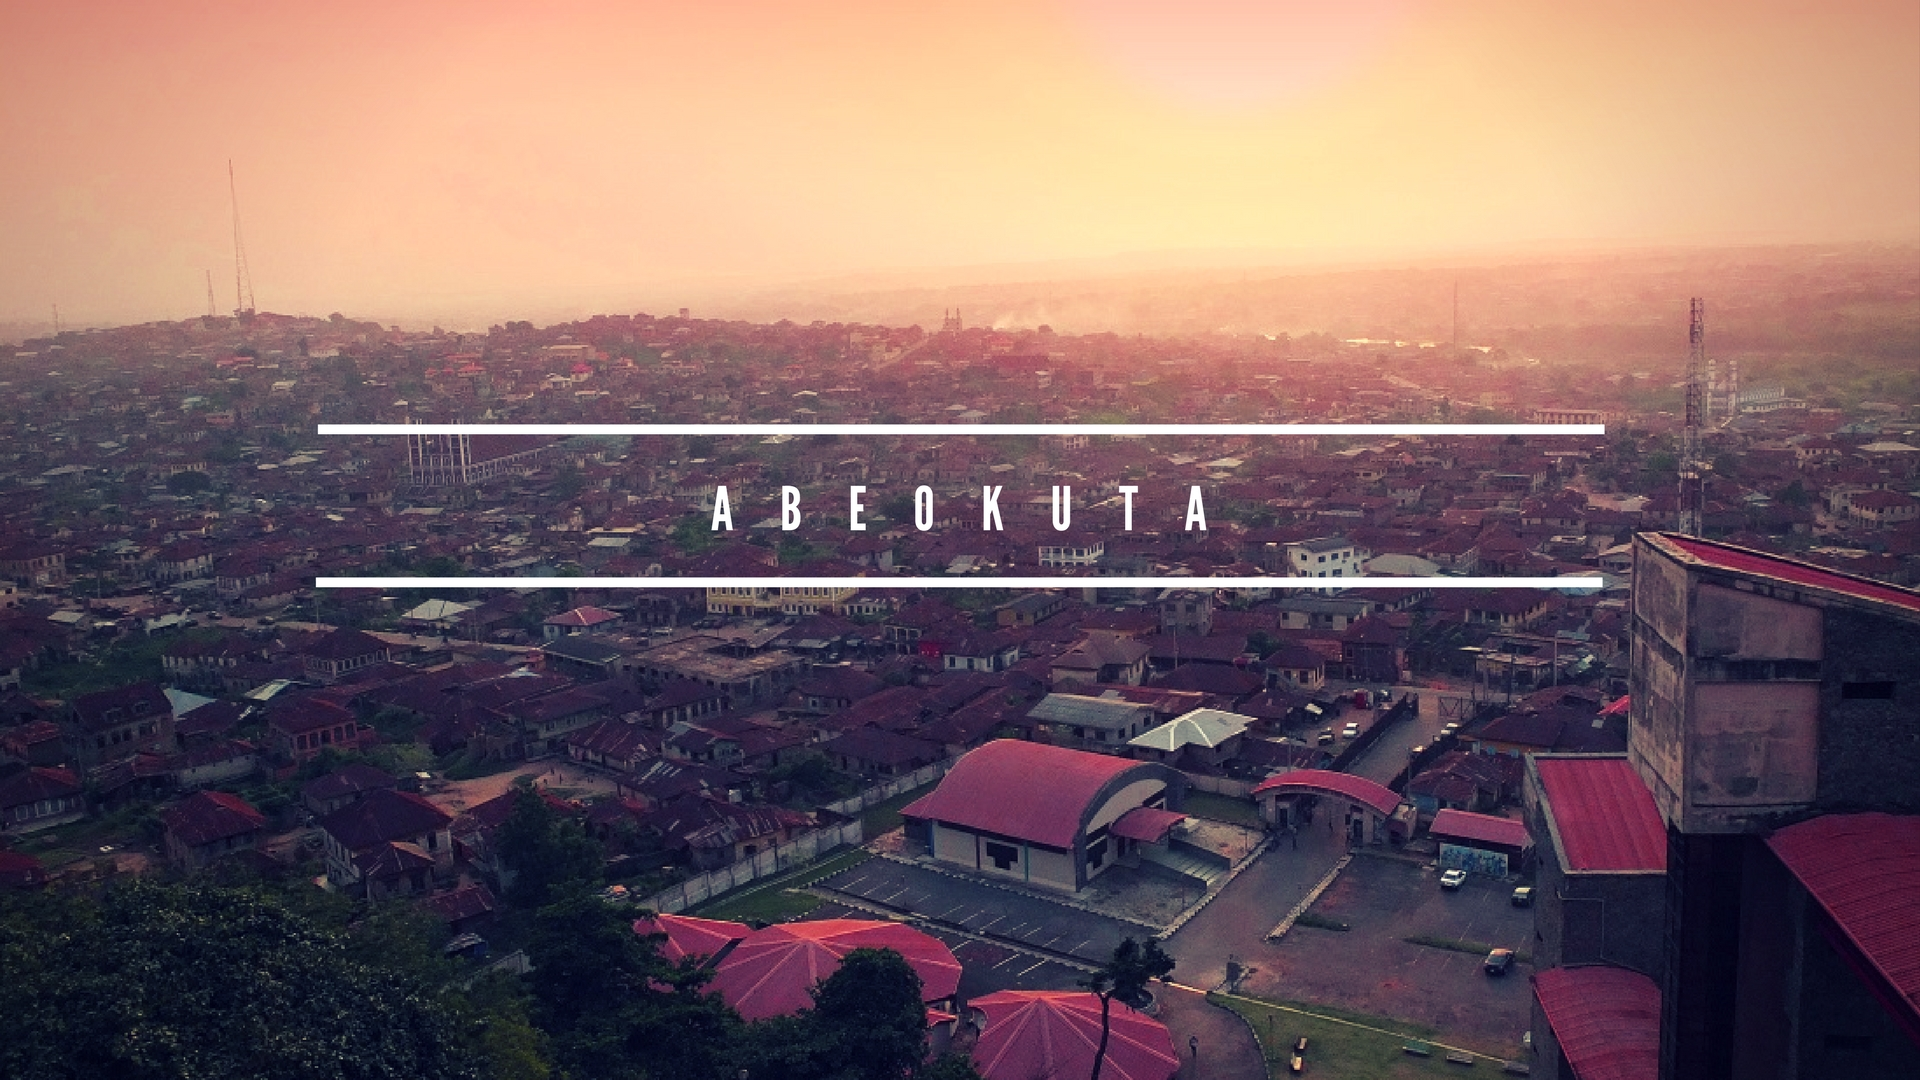 Abeokuta